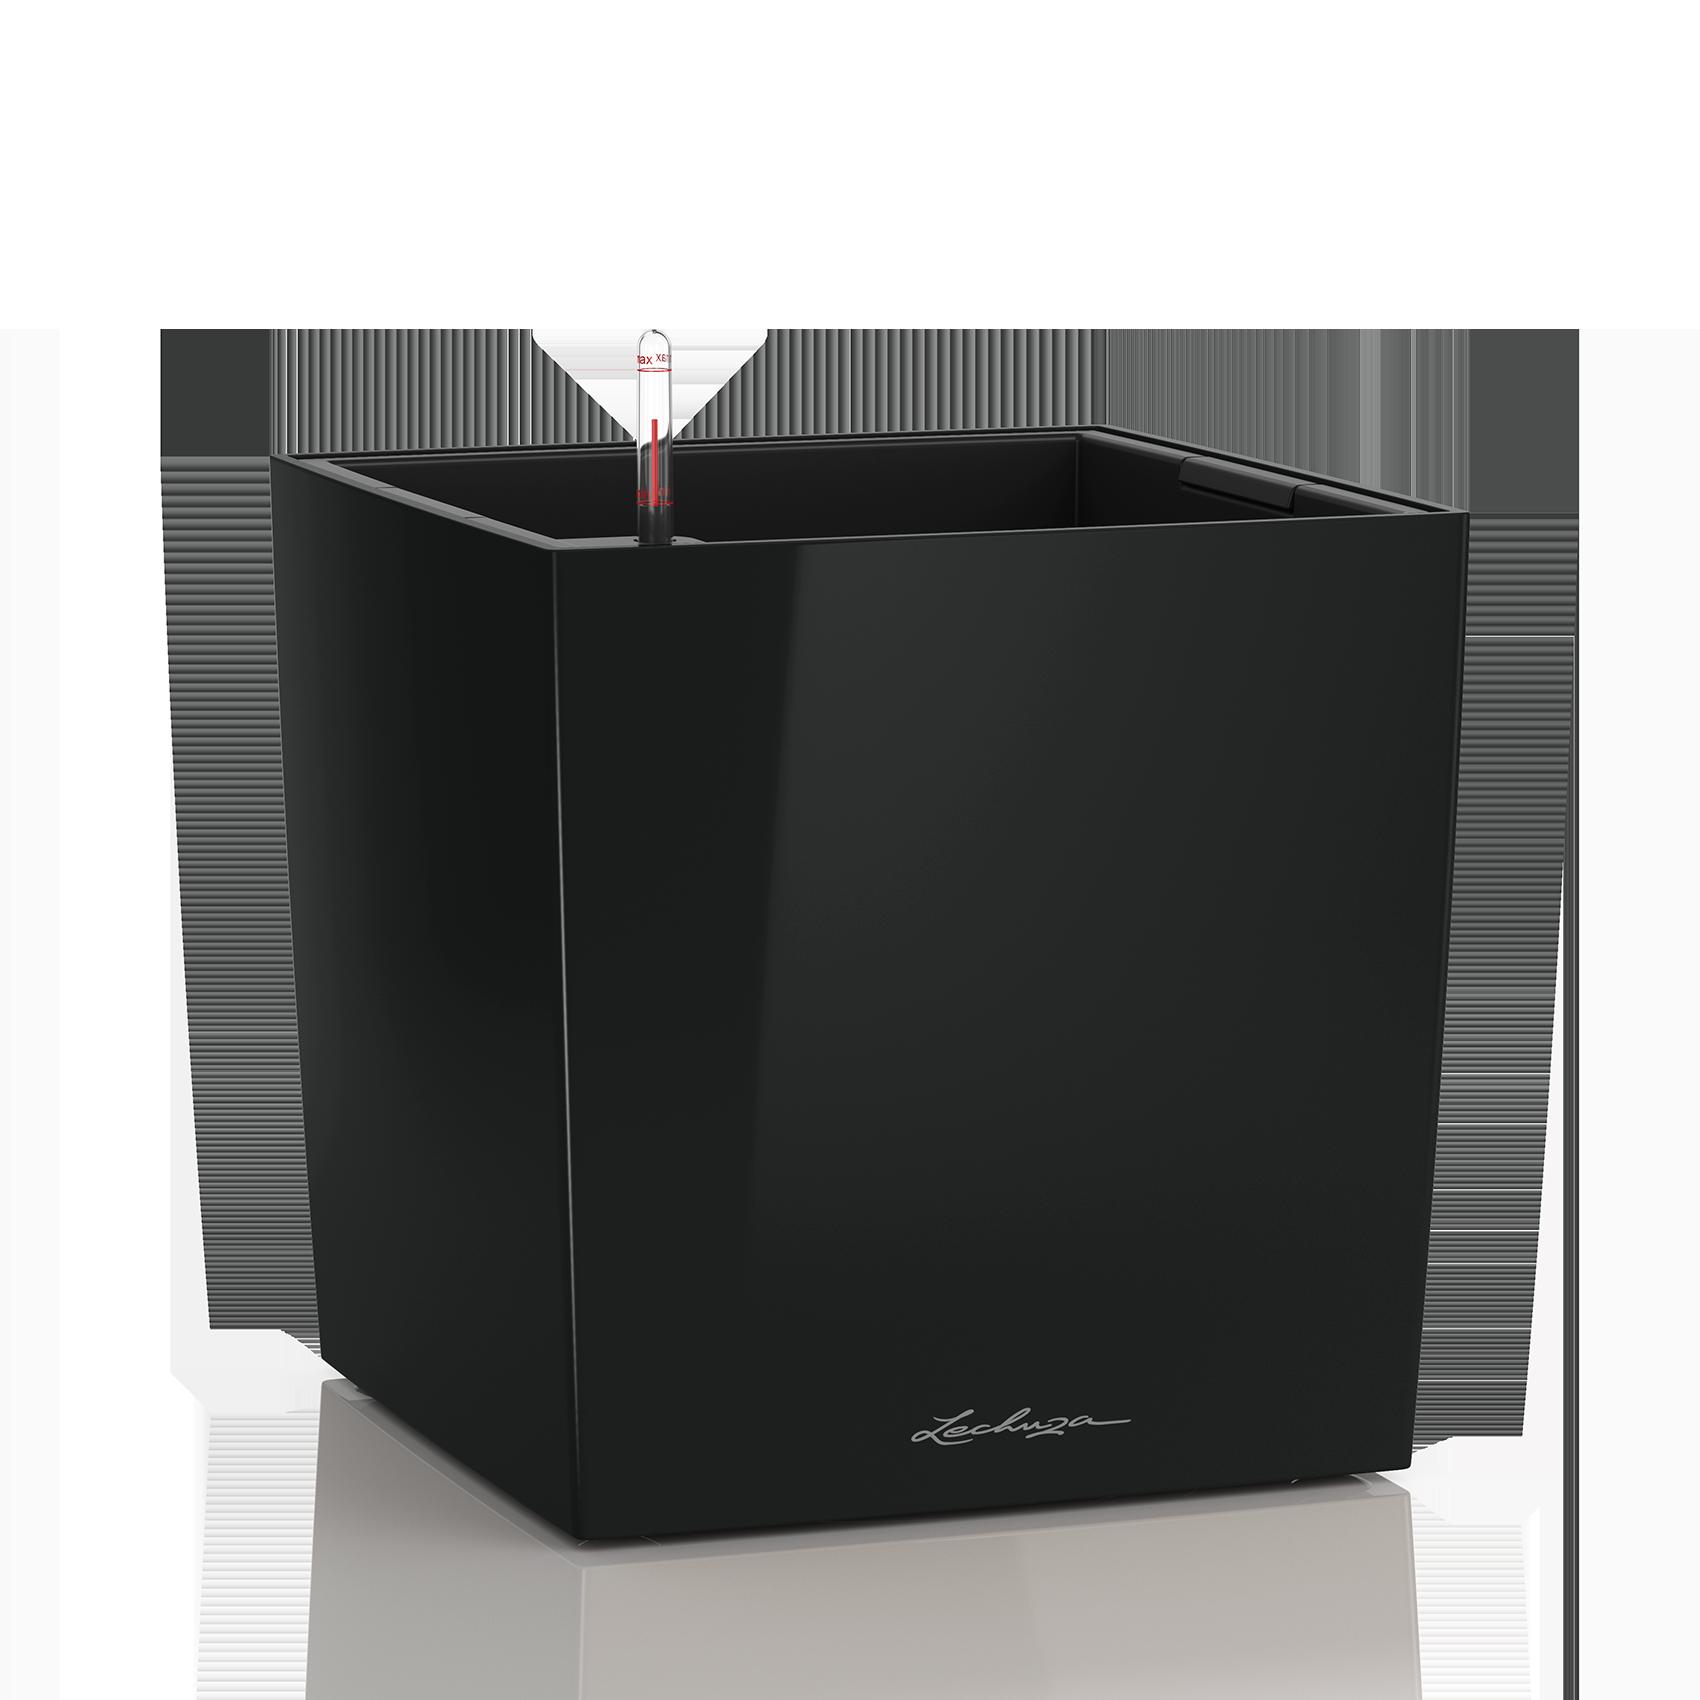 CUBE 50 black high-gloss